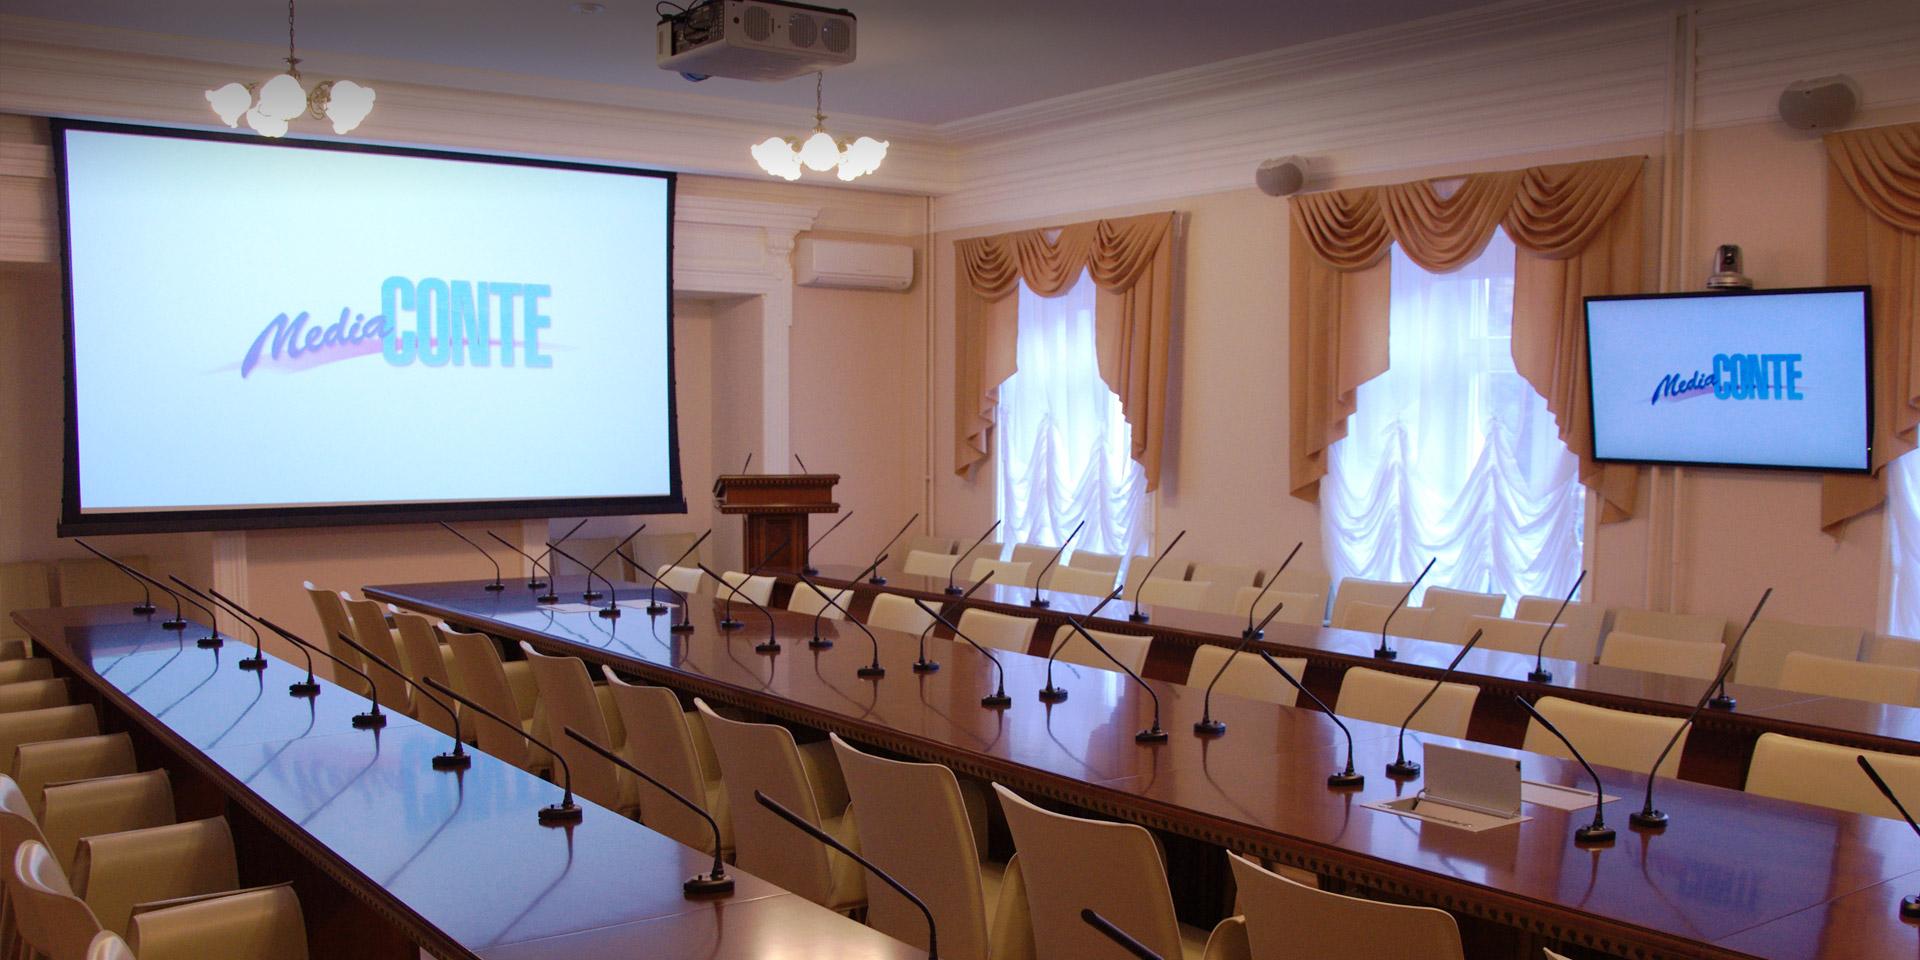 Конференц-залы, залы заседаний и совещаний